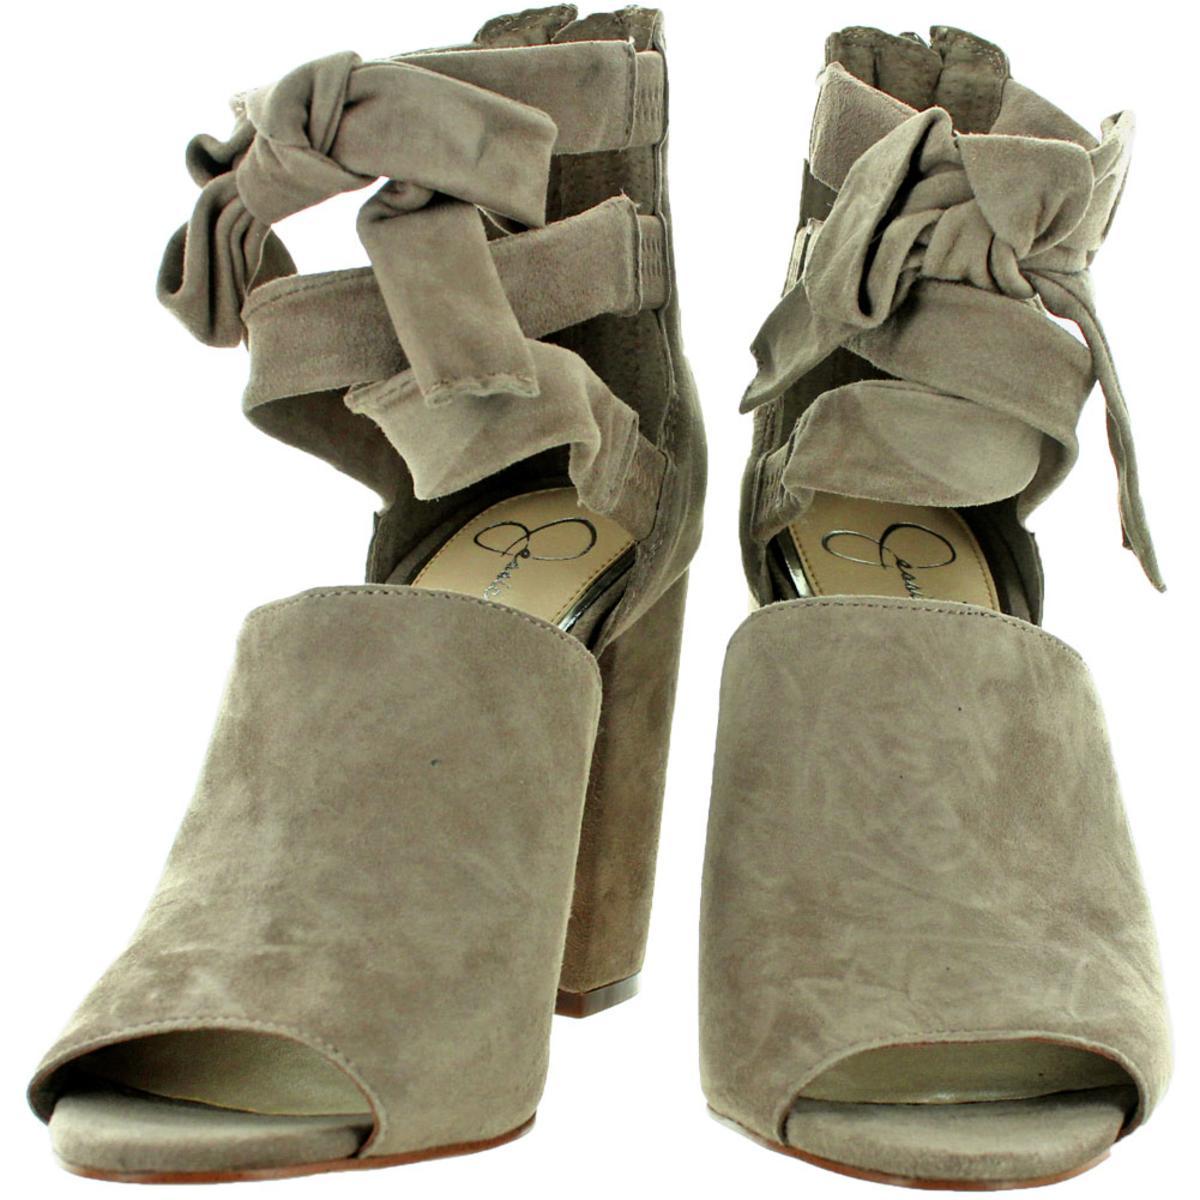 Jessica-Simpson-Kandiss-Women-039-s-Open-Toe-Block-Heel-Dress-Shoes thumbnail 9